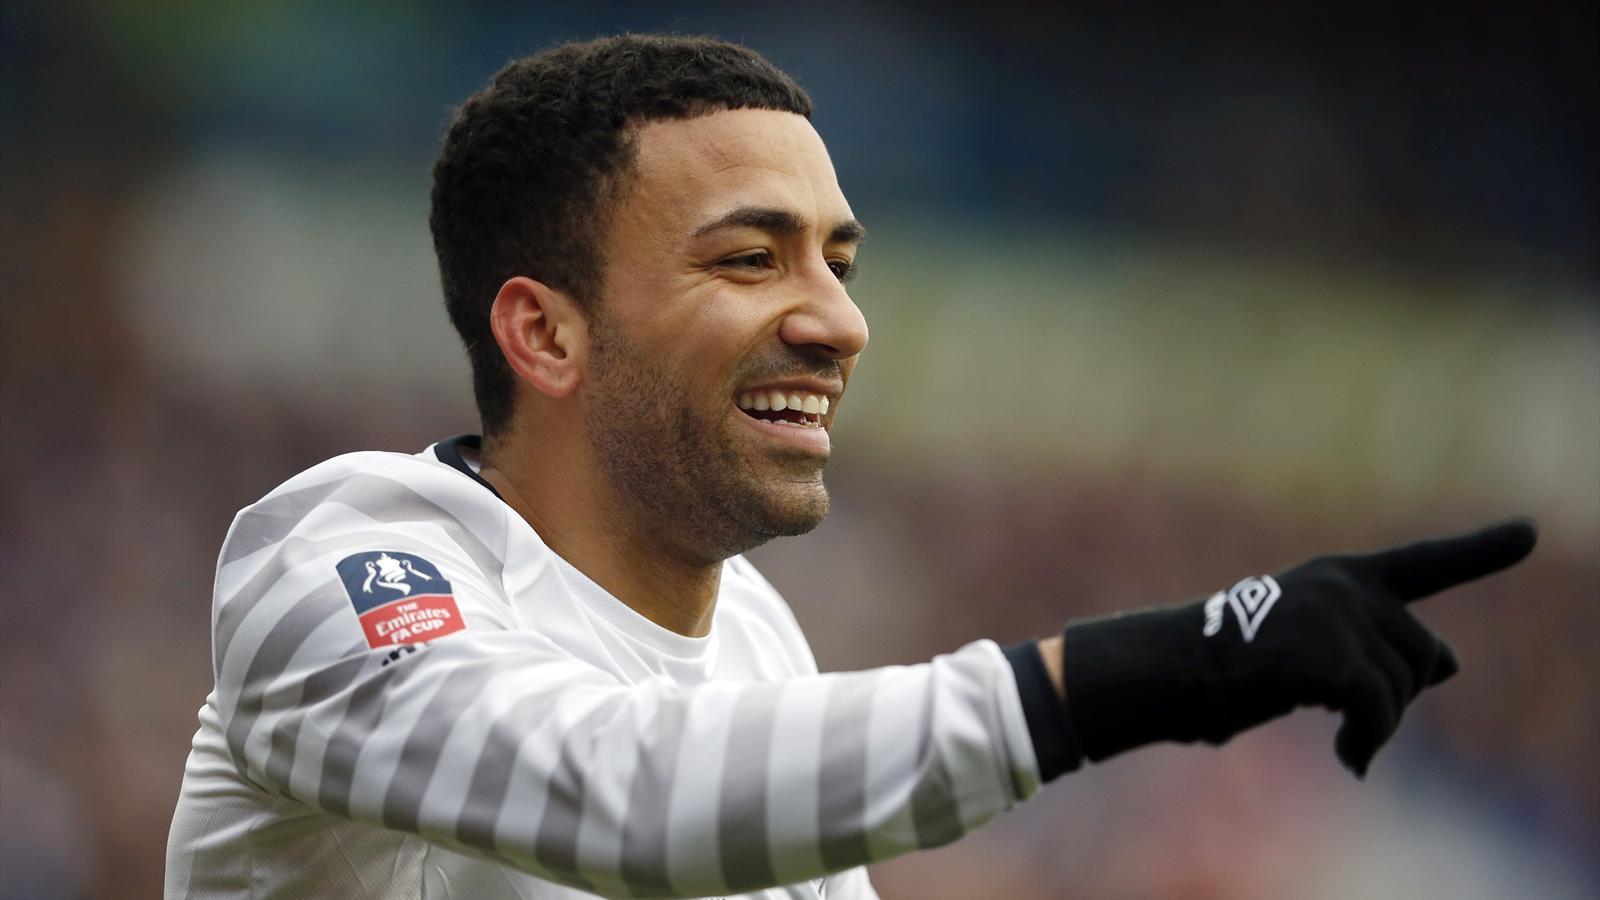 Aaron Lennon celebrates scoring the second goal for Everton